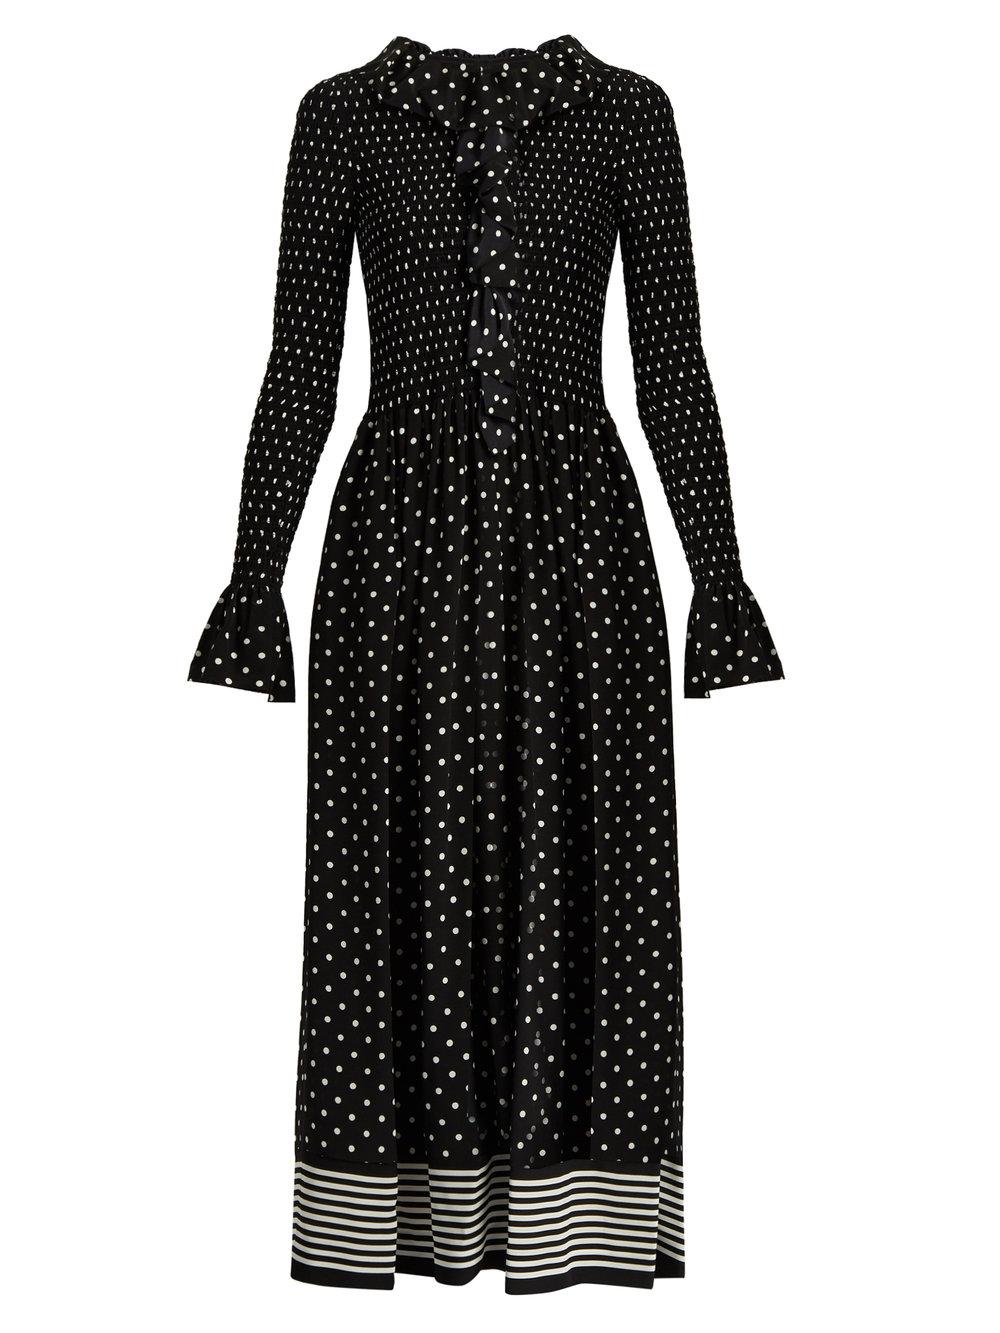 Stella McCartney £2340